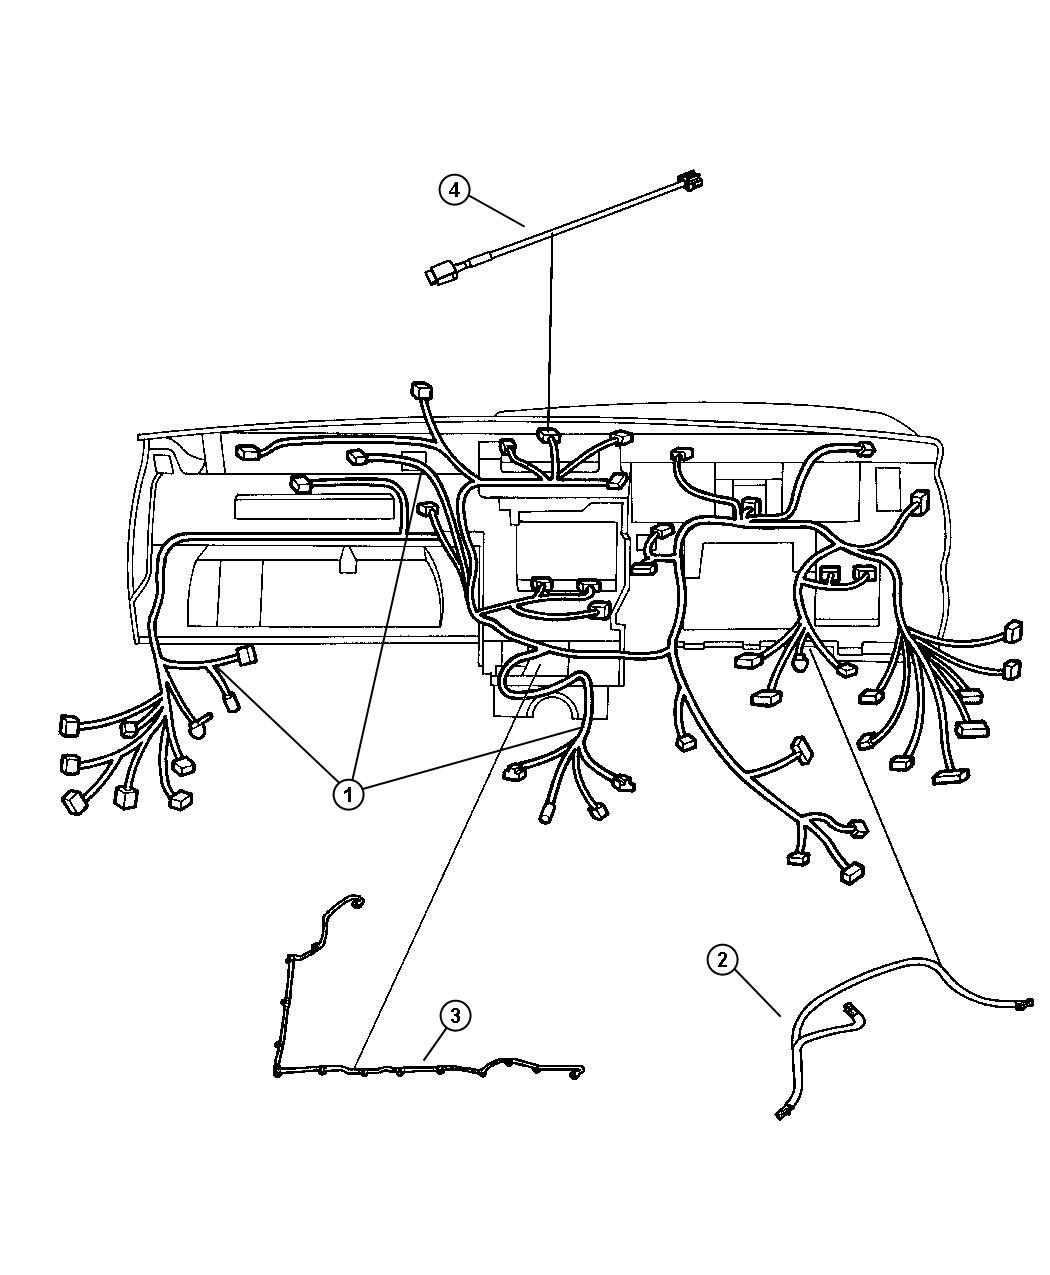 Jeep Grand Cherokee Wiring Hands Free Communication